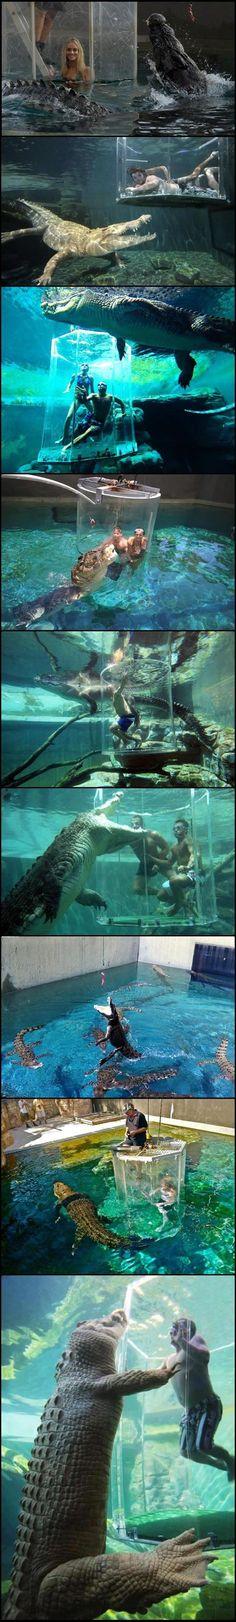 Swimming with alligators.